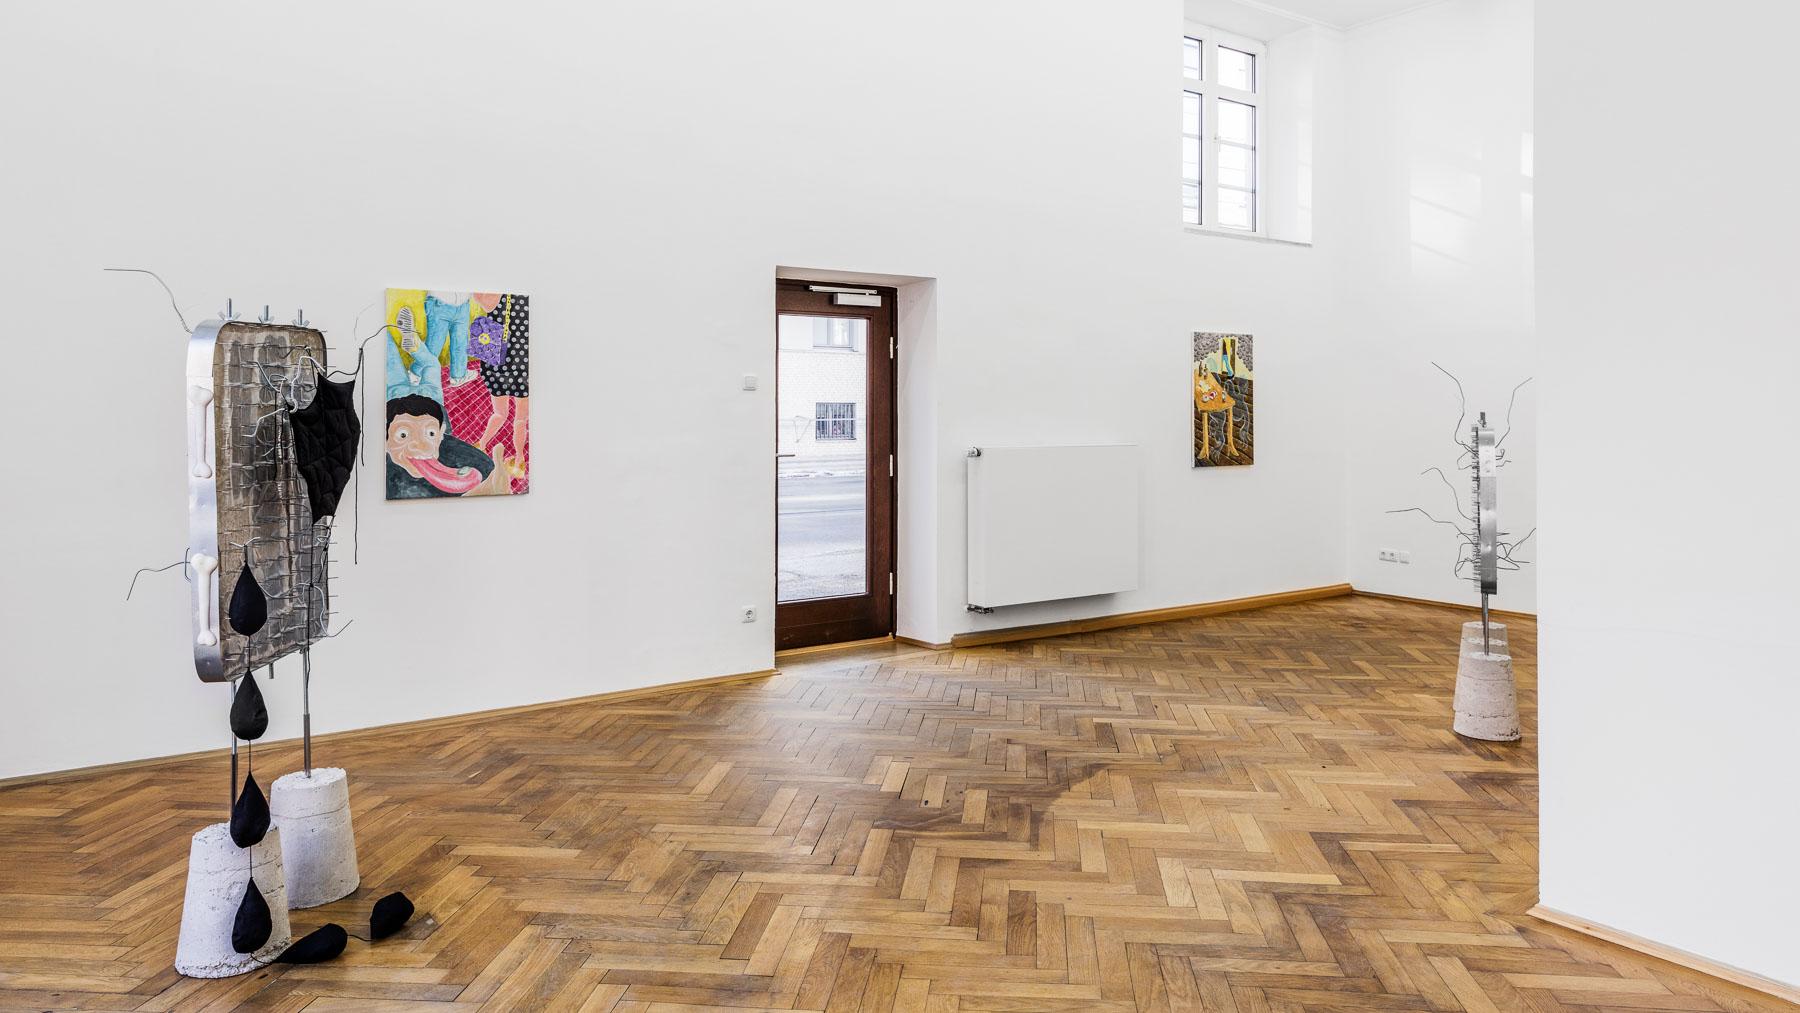 Stefan Fuchs, Saturdays People, installation view